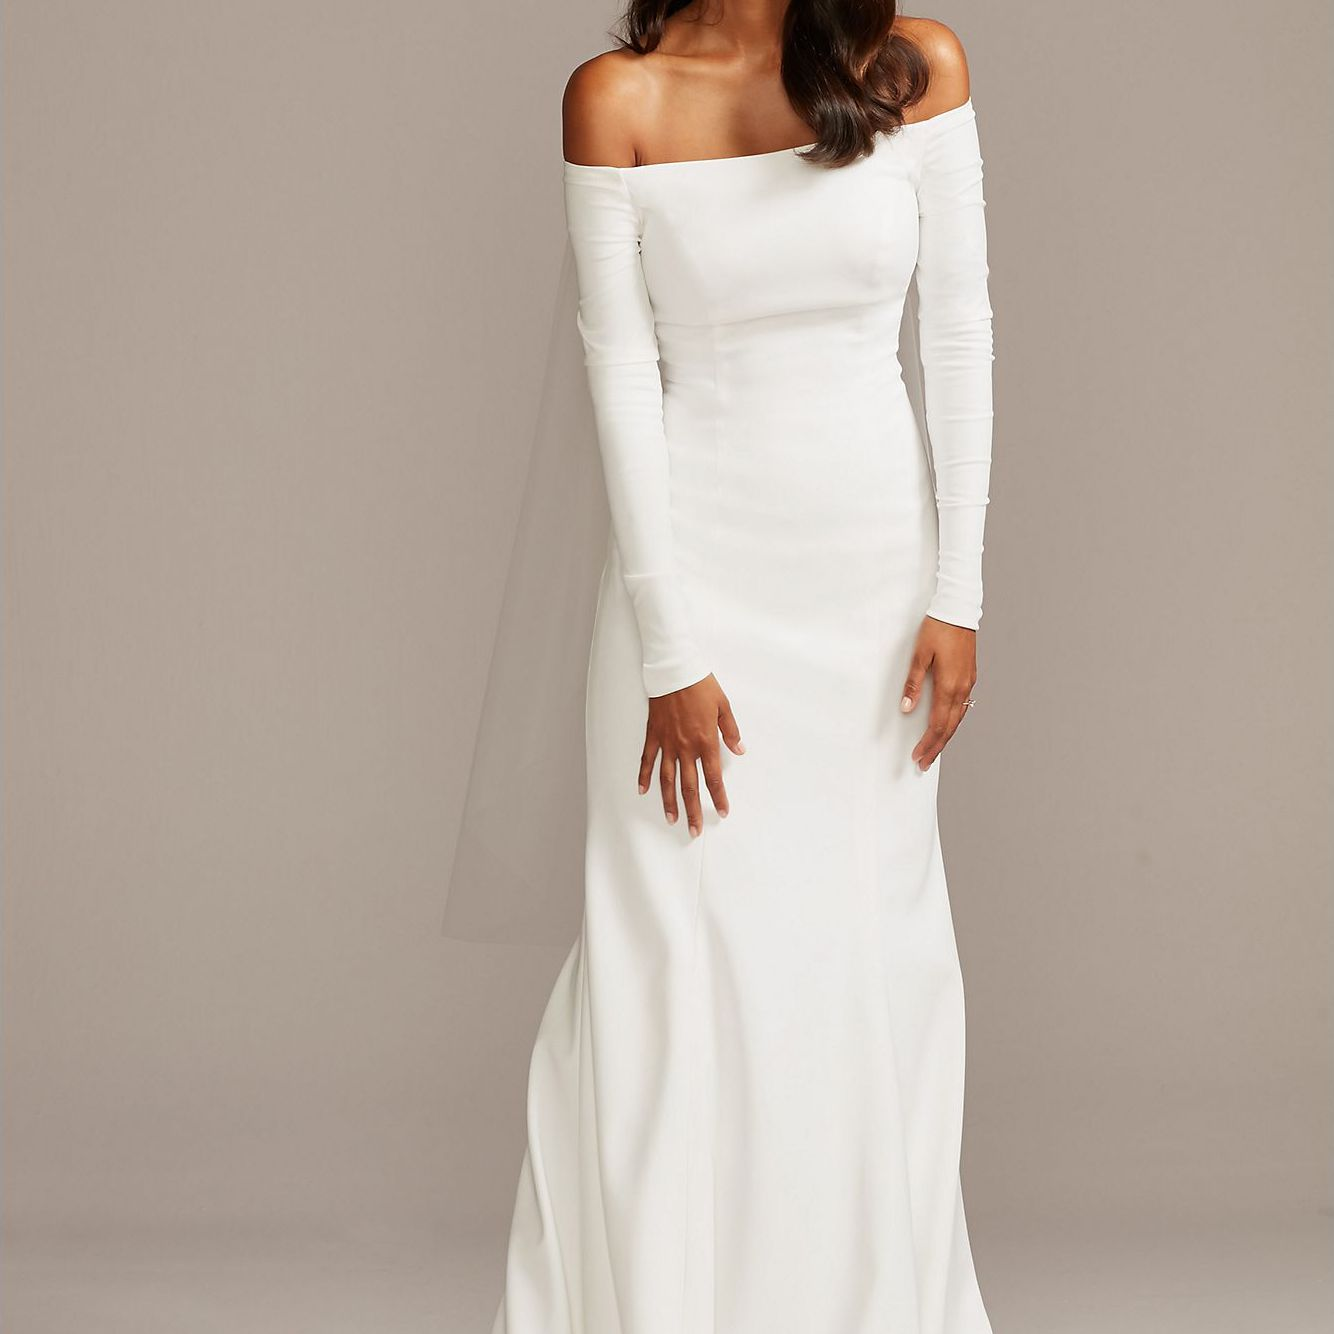 18 Best Simple Wedding Dresses of 18